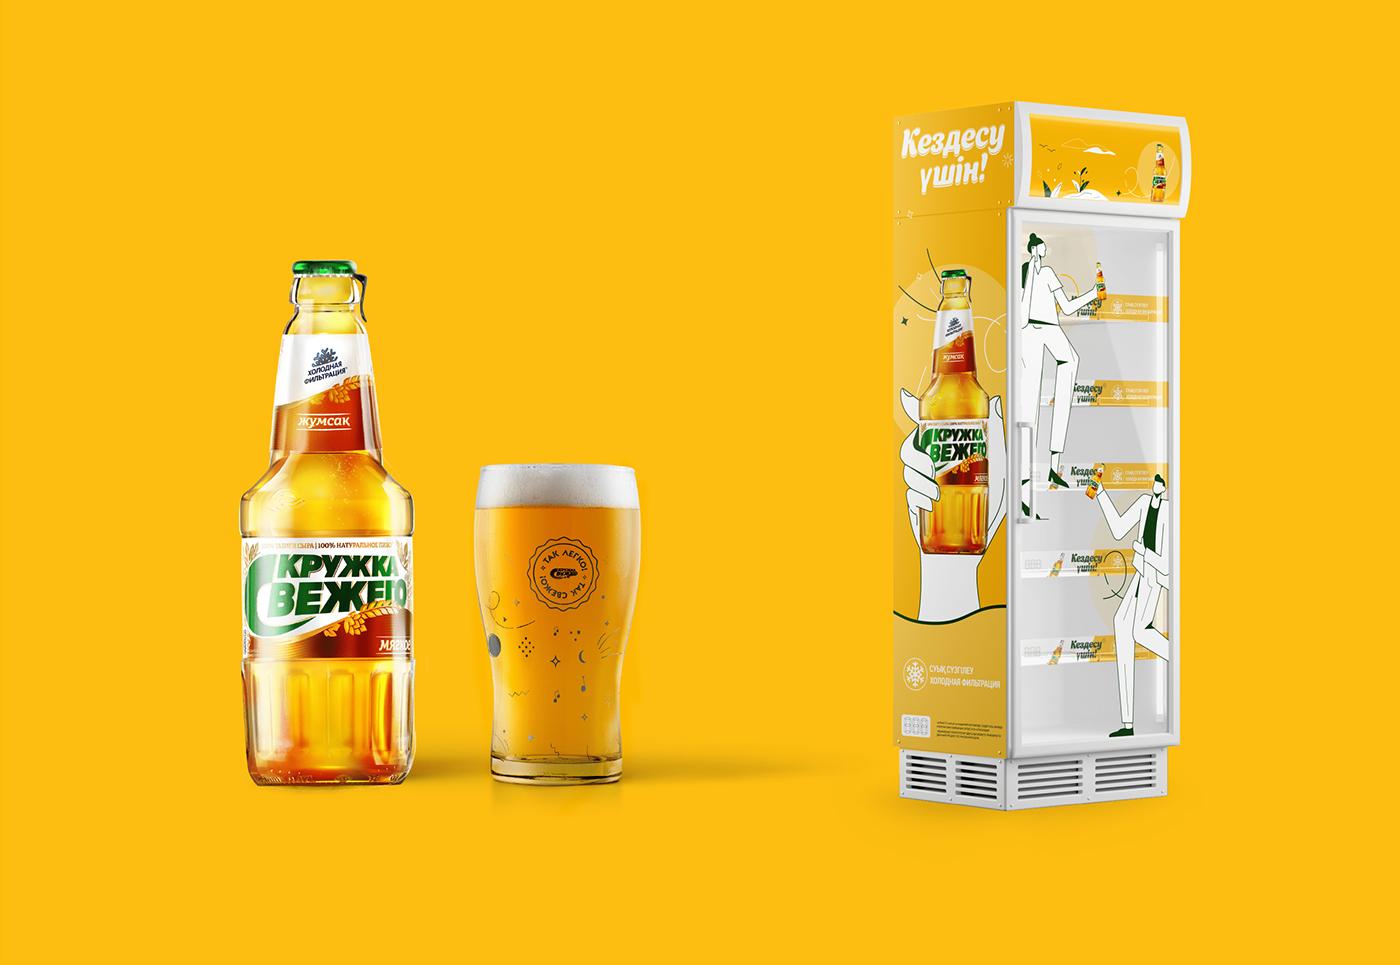 Advertising  alcohol beer branding  fresh ILLUSTRATION  Kruzhka Svezhego yellow